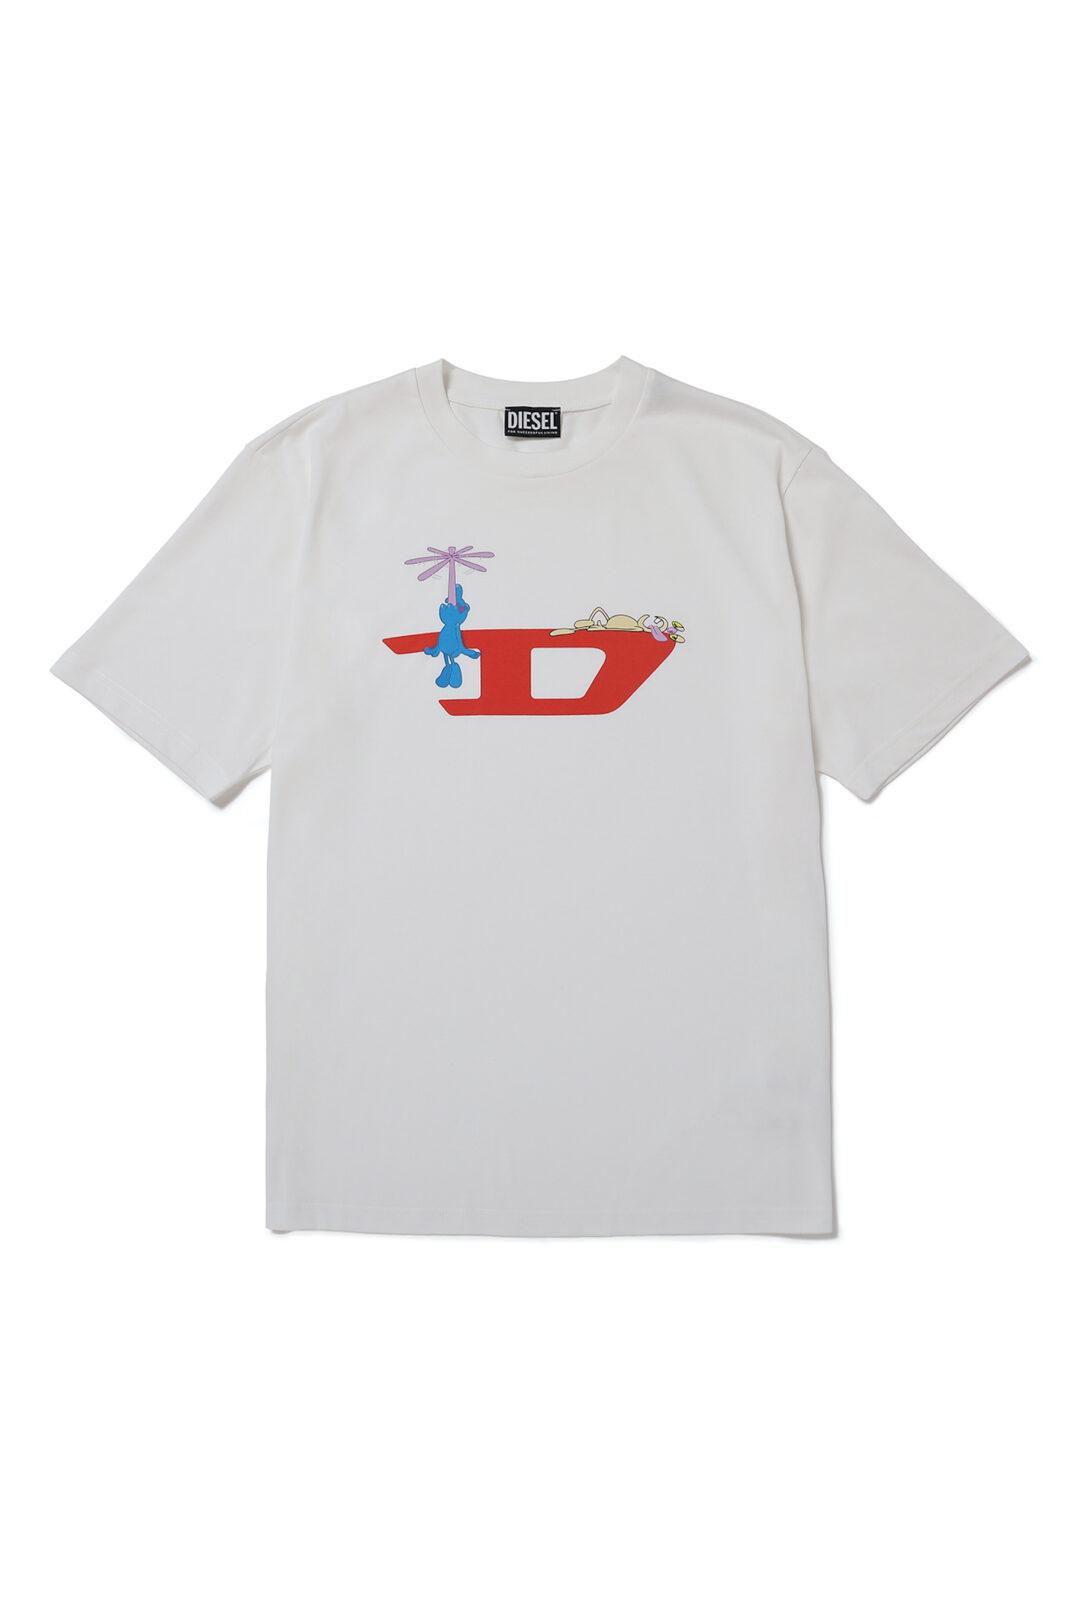 Tシャツ 白 ¥11,000 *「ディーゼル 渋谷」「ディーゼルオンラインストア」で販売。